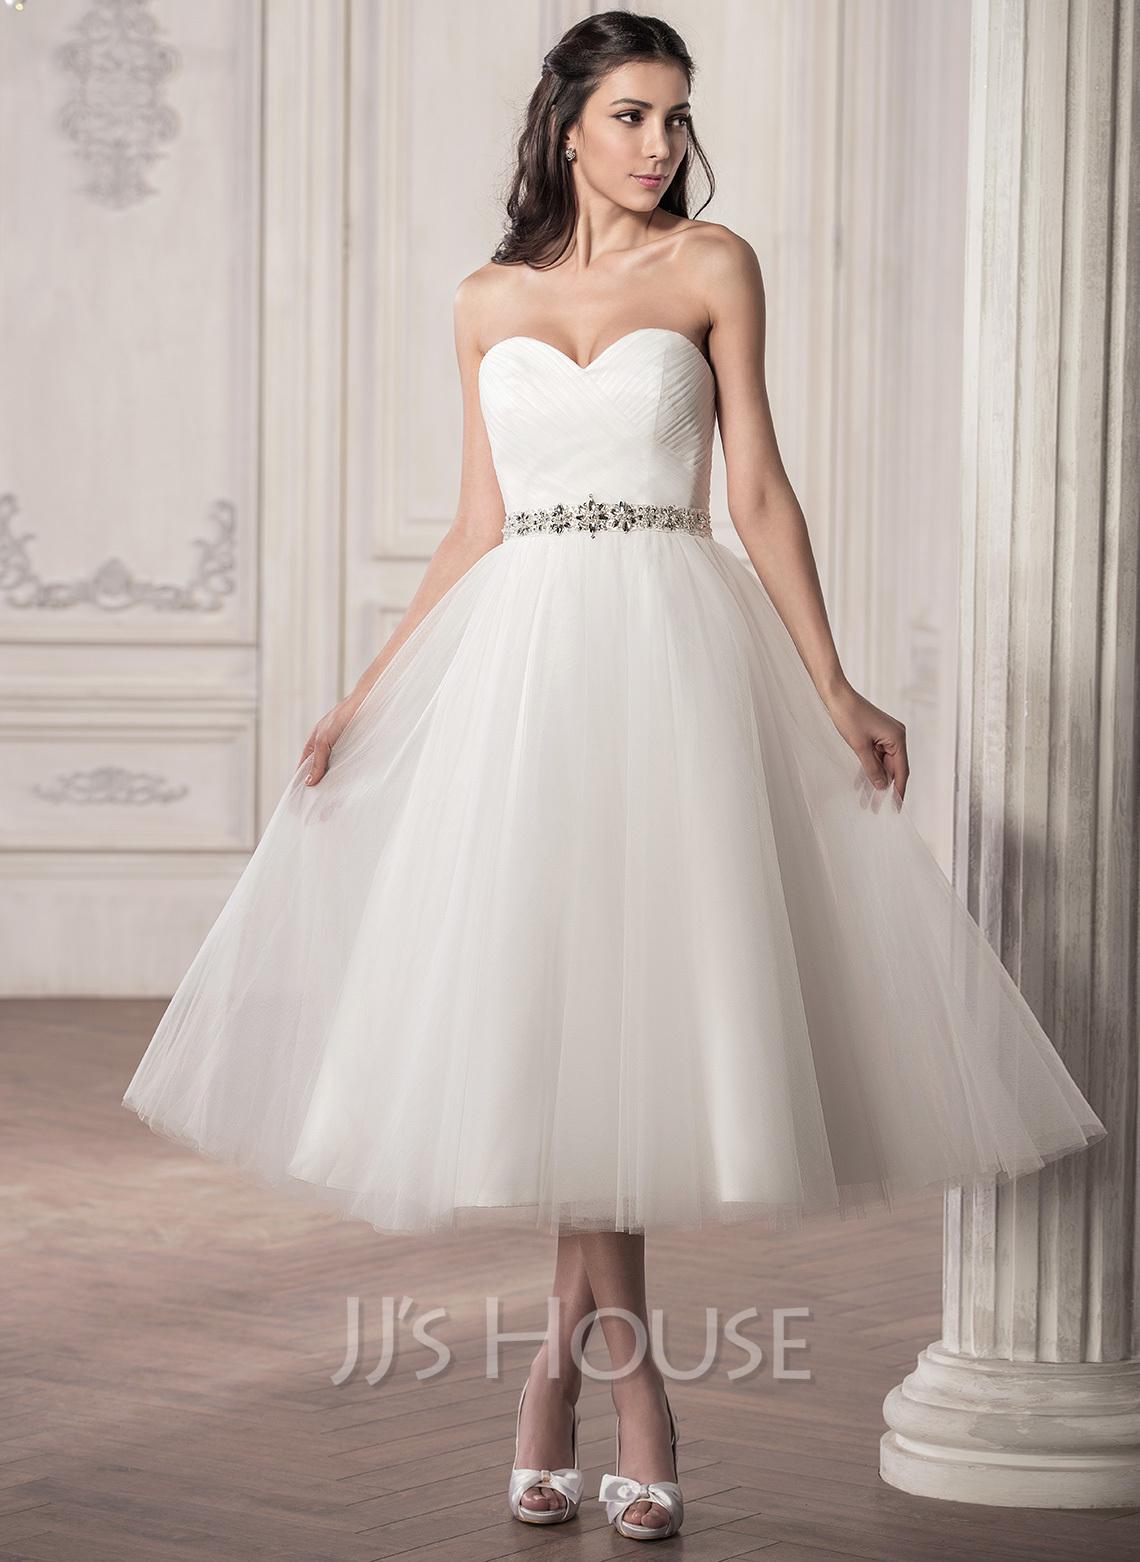 A Line Princess Sweetheart Tea Length Tulle Wedding Dress With Ruffle Beading